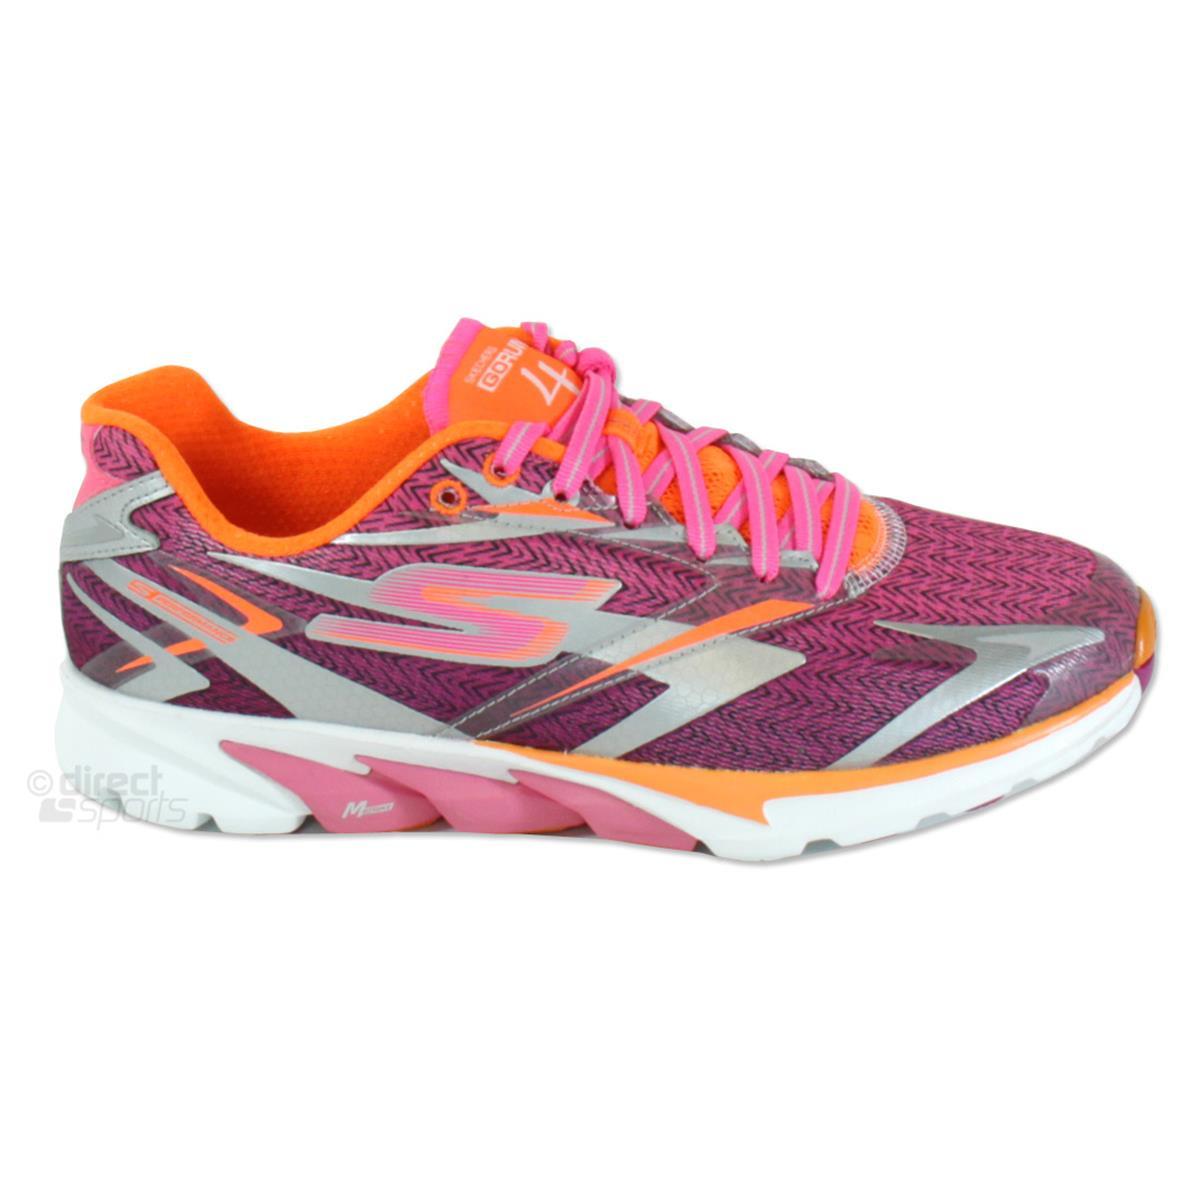 64b0786369b216 Skechers GoRun 4 Womens Running Shoes (Hot Pink ...